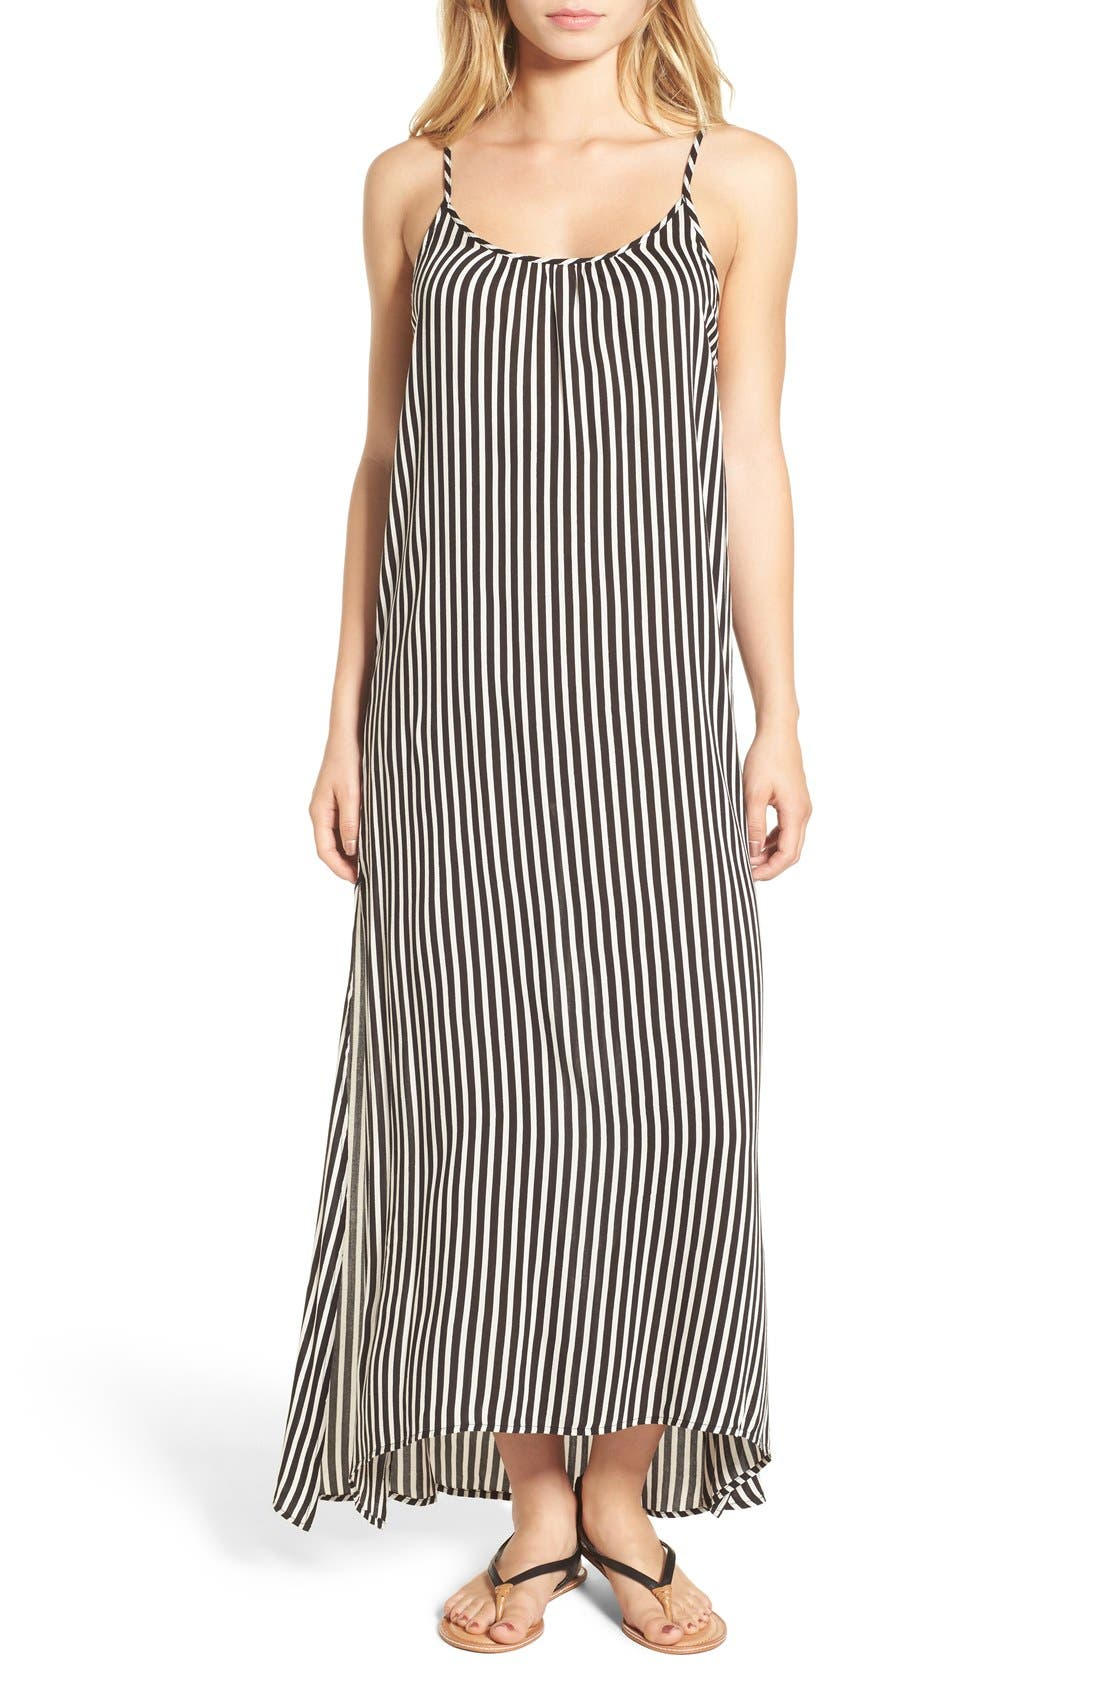 Main Image - Billabong 'Easy Does It' Stripe Maxi Dress